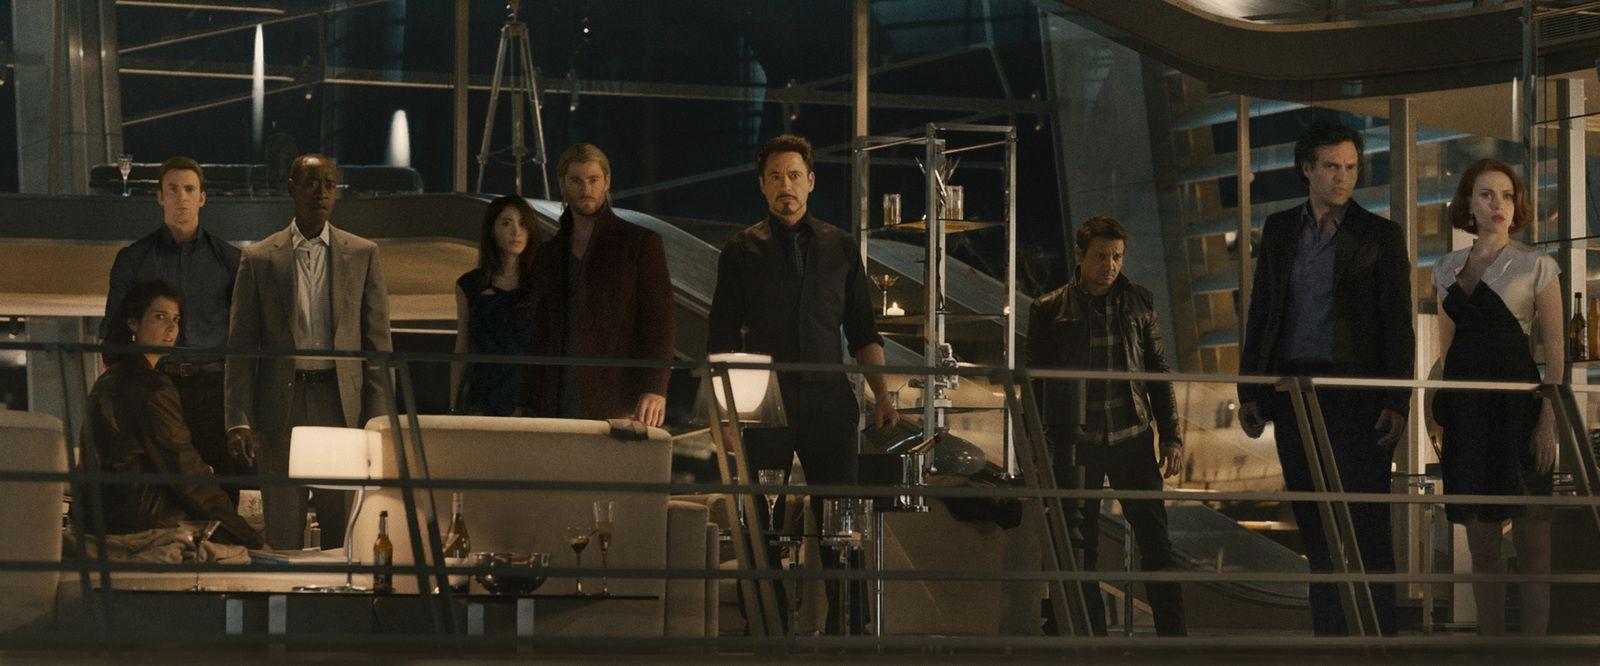 Avengers 2 : promo art + new photo